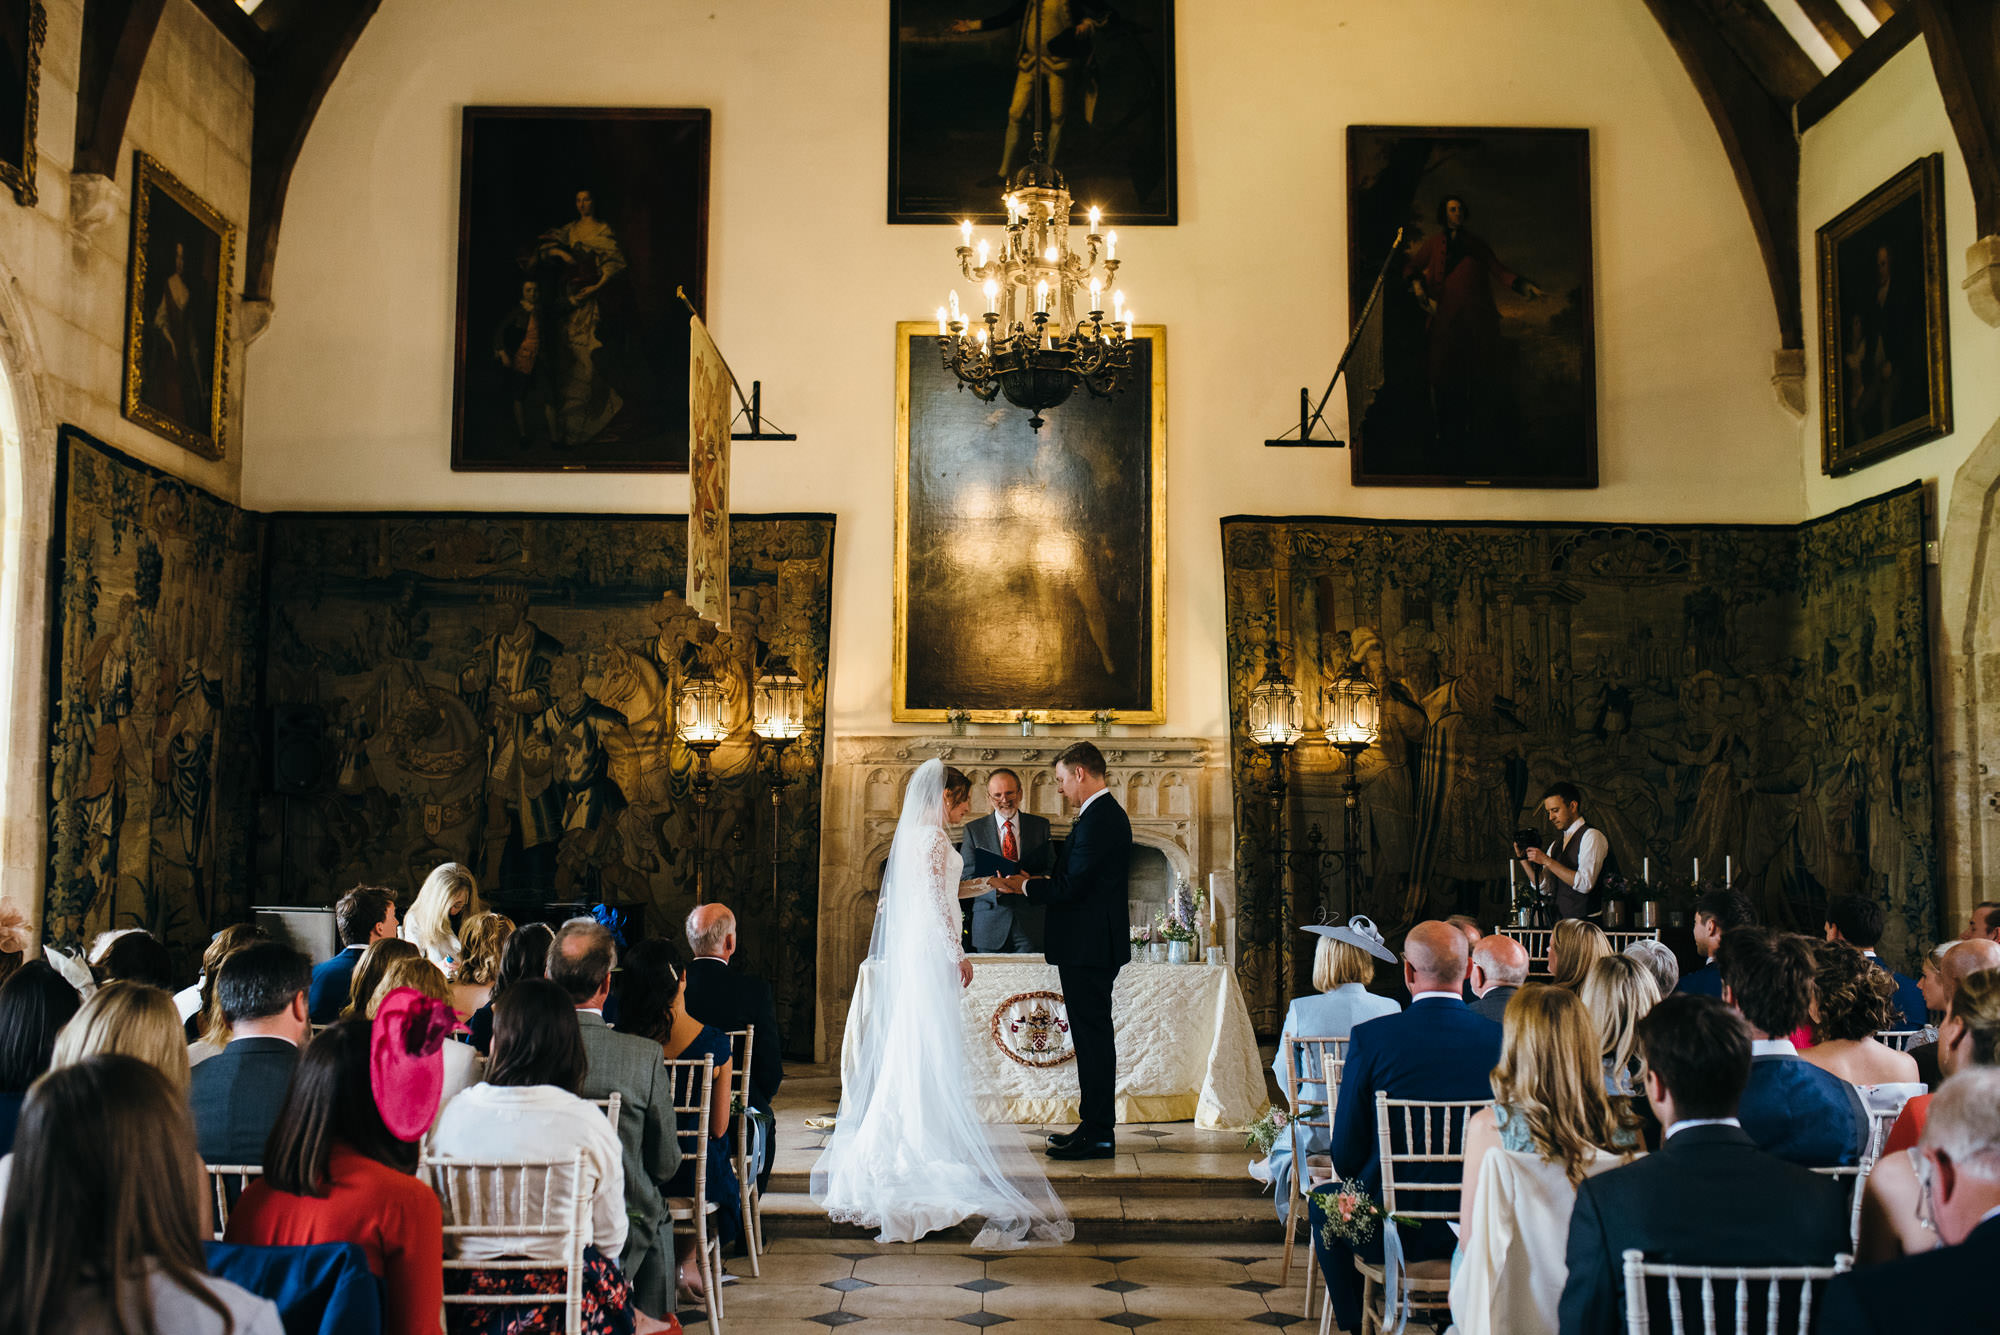 Berkeley castle wedding captured by simon biffen photography 17